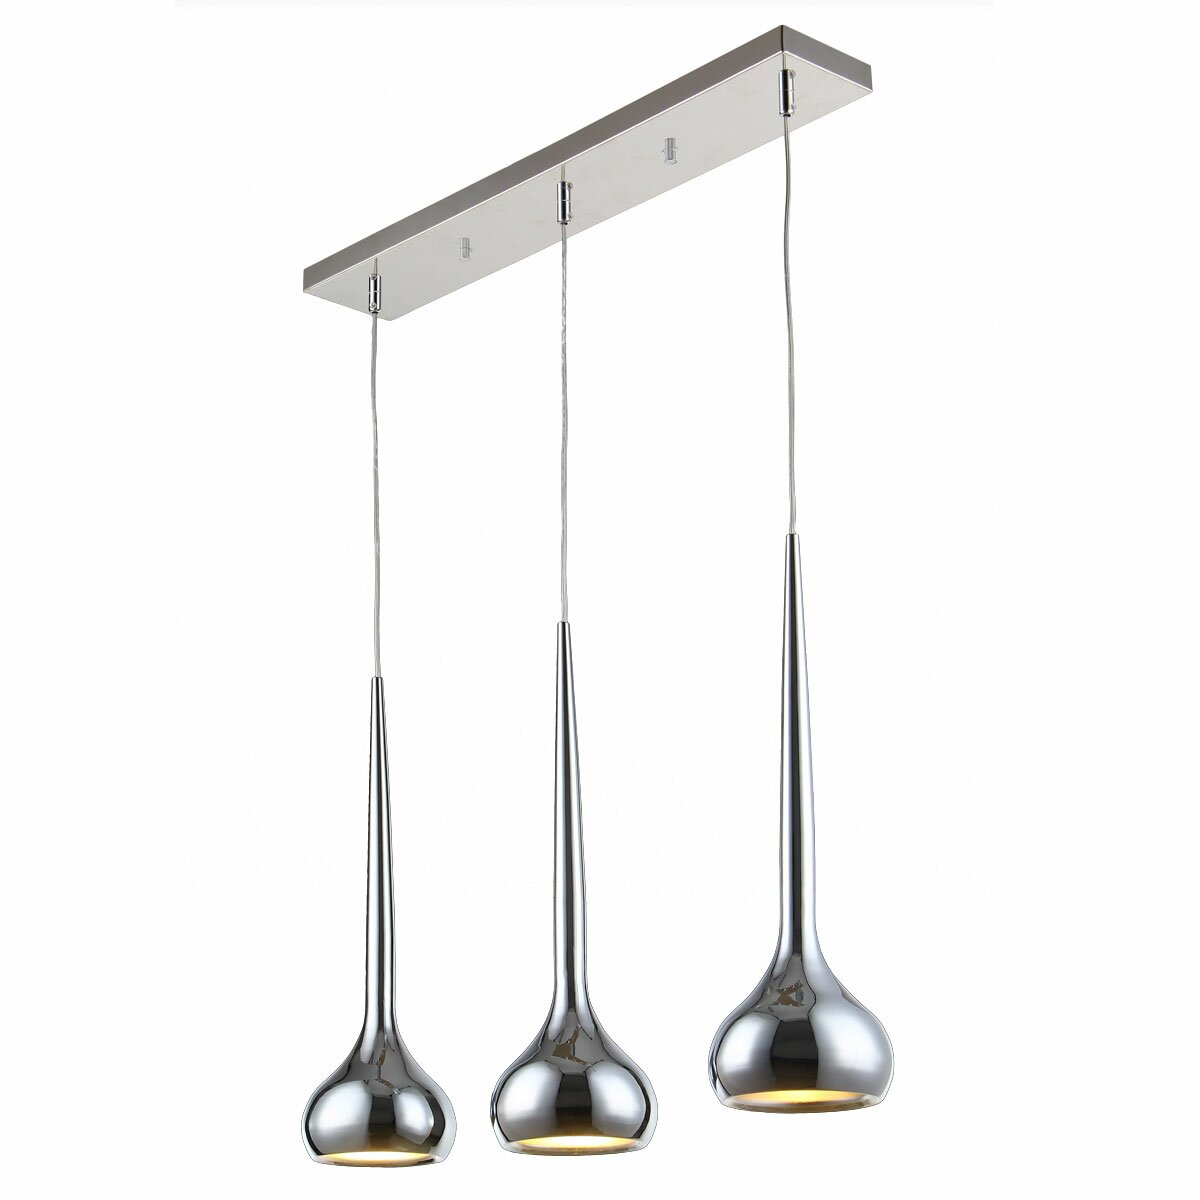 Bromi design wade 3 light kitchen island pendant reviews for Pendants lights for kitchen island